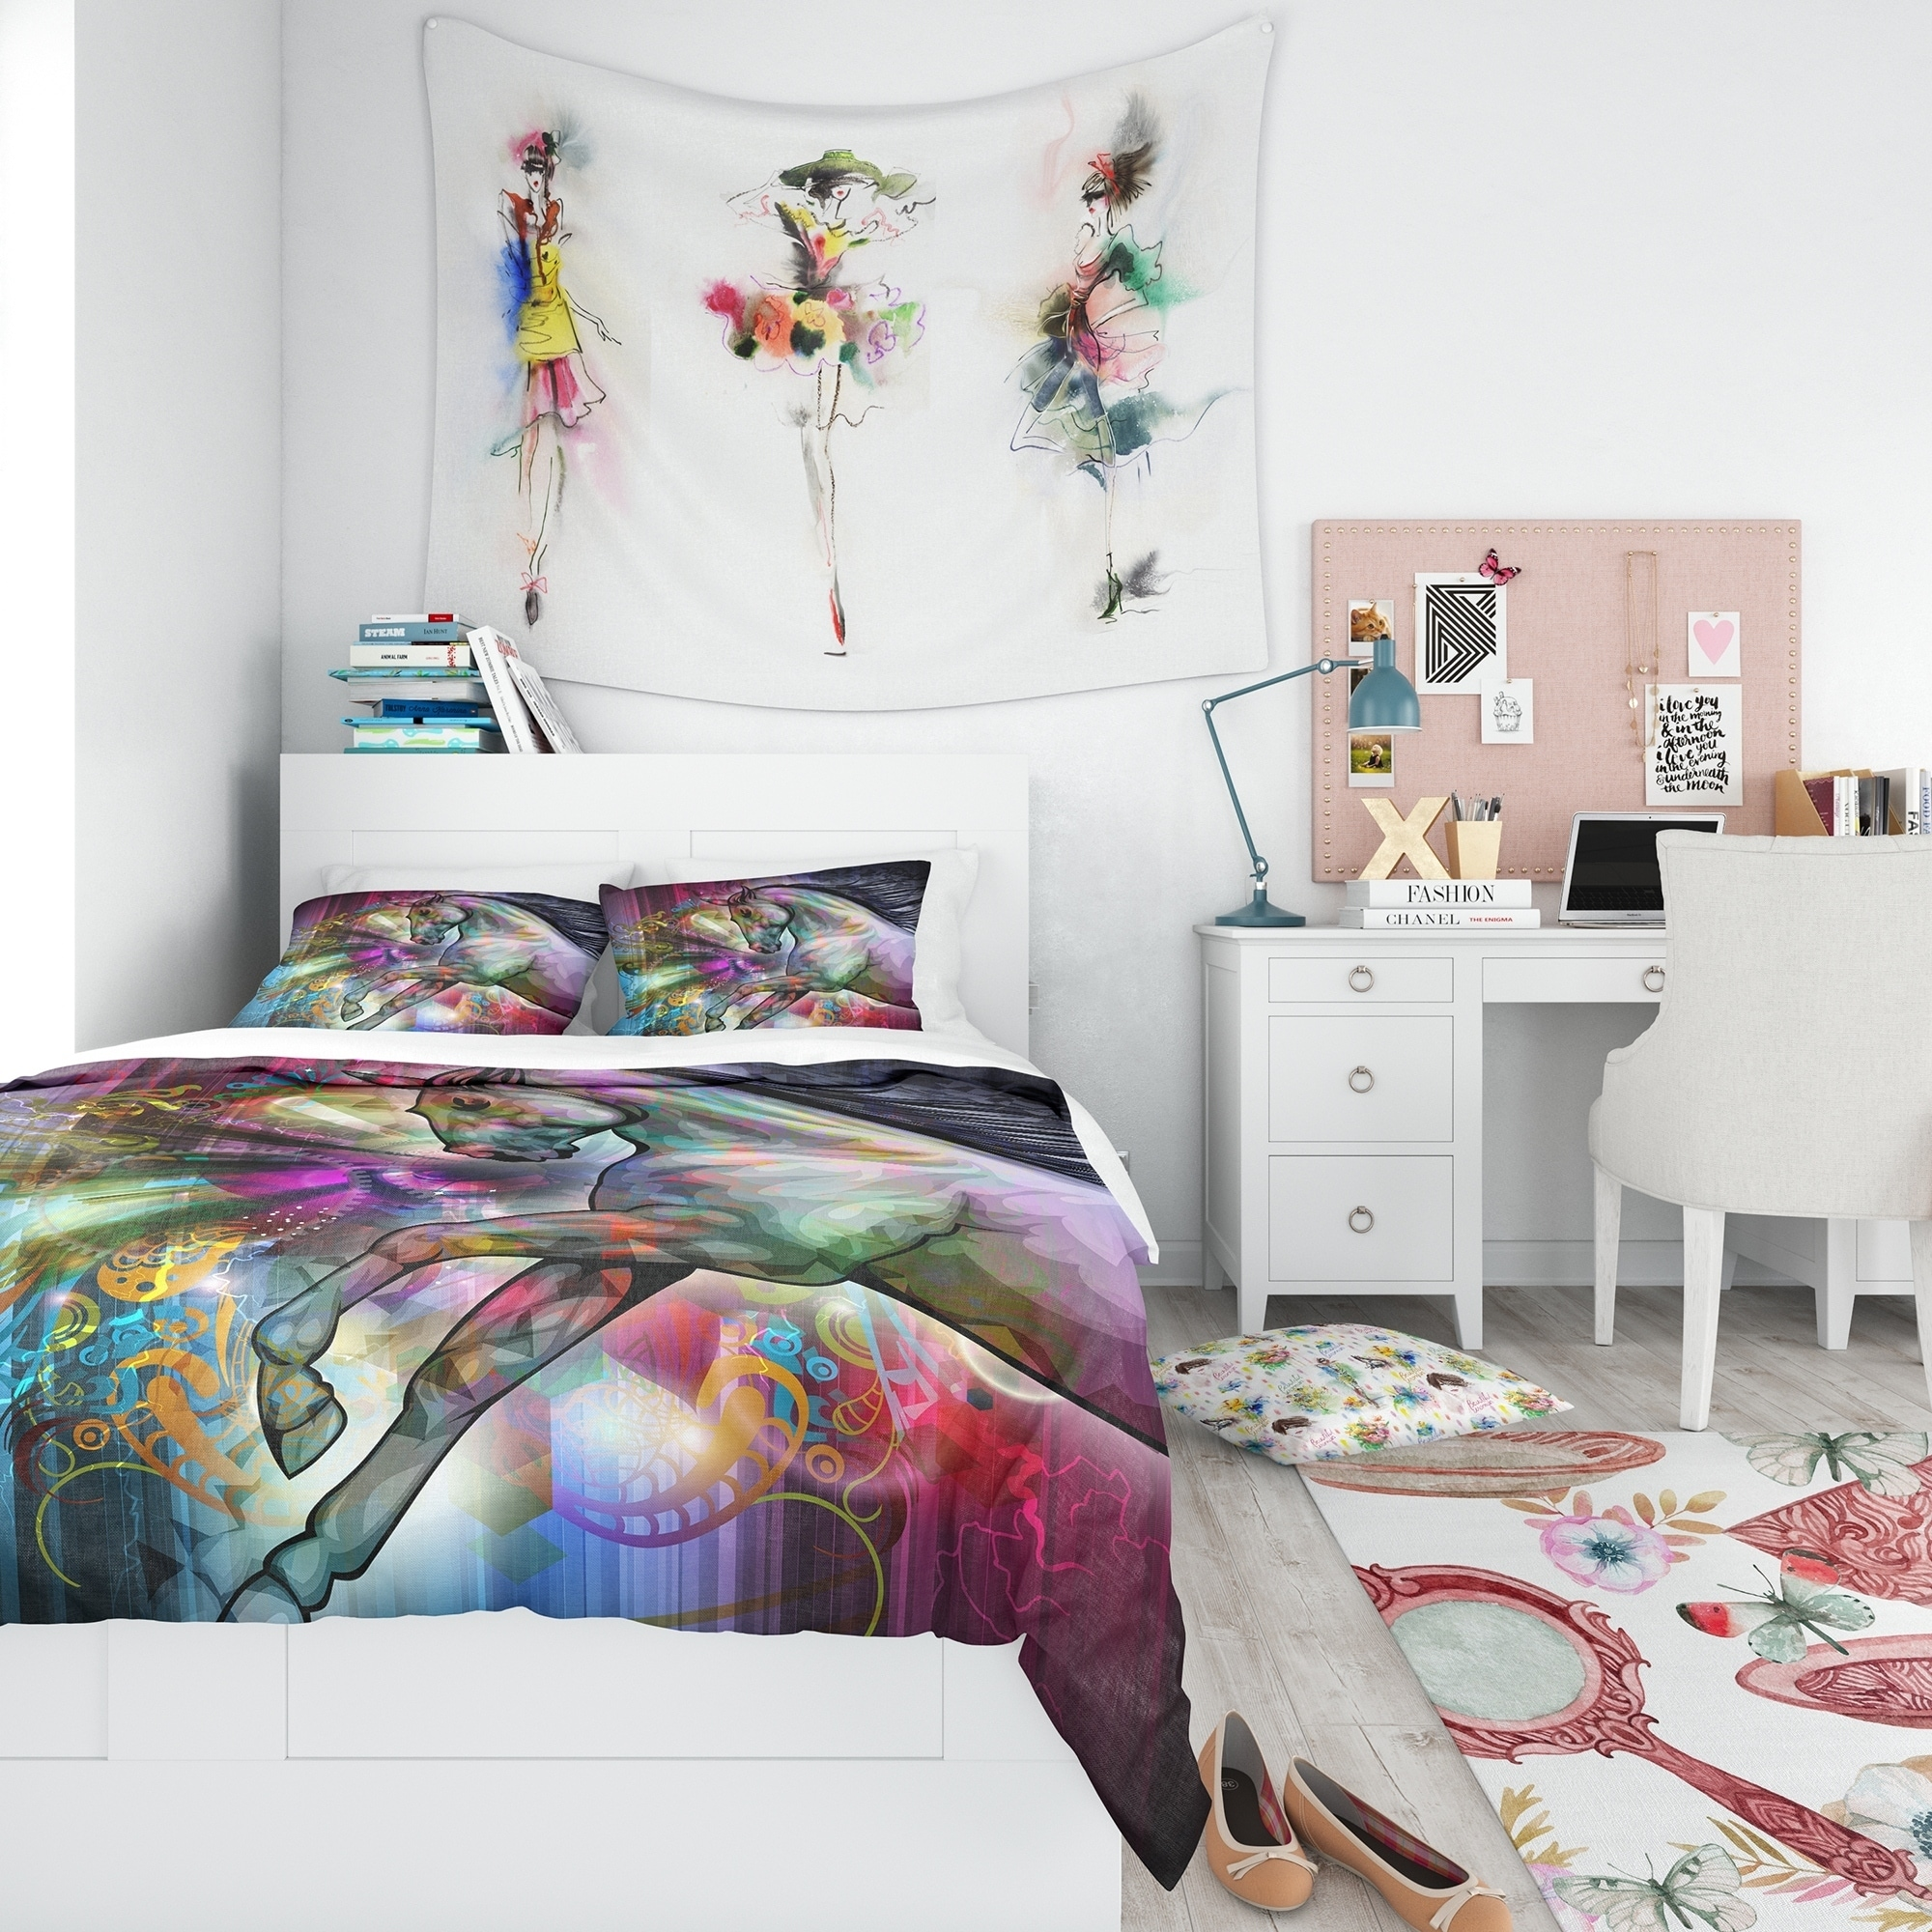 Home Furniture Diy Bedding Sets Duvet Covers Black Horse King Size Duvet Cover 2 X Pillowcase Set Animal Bedding Free P P Bortexgroup Com